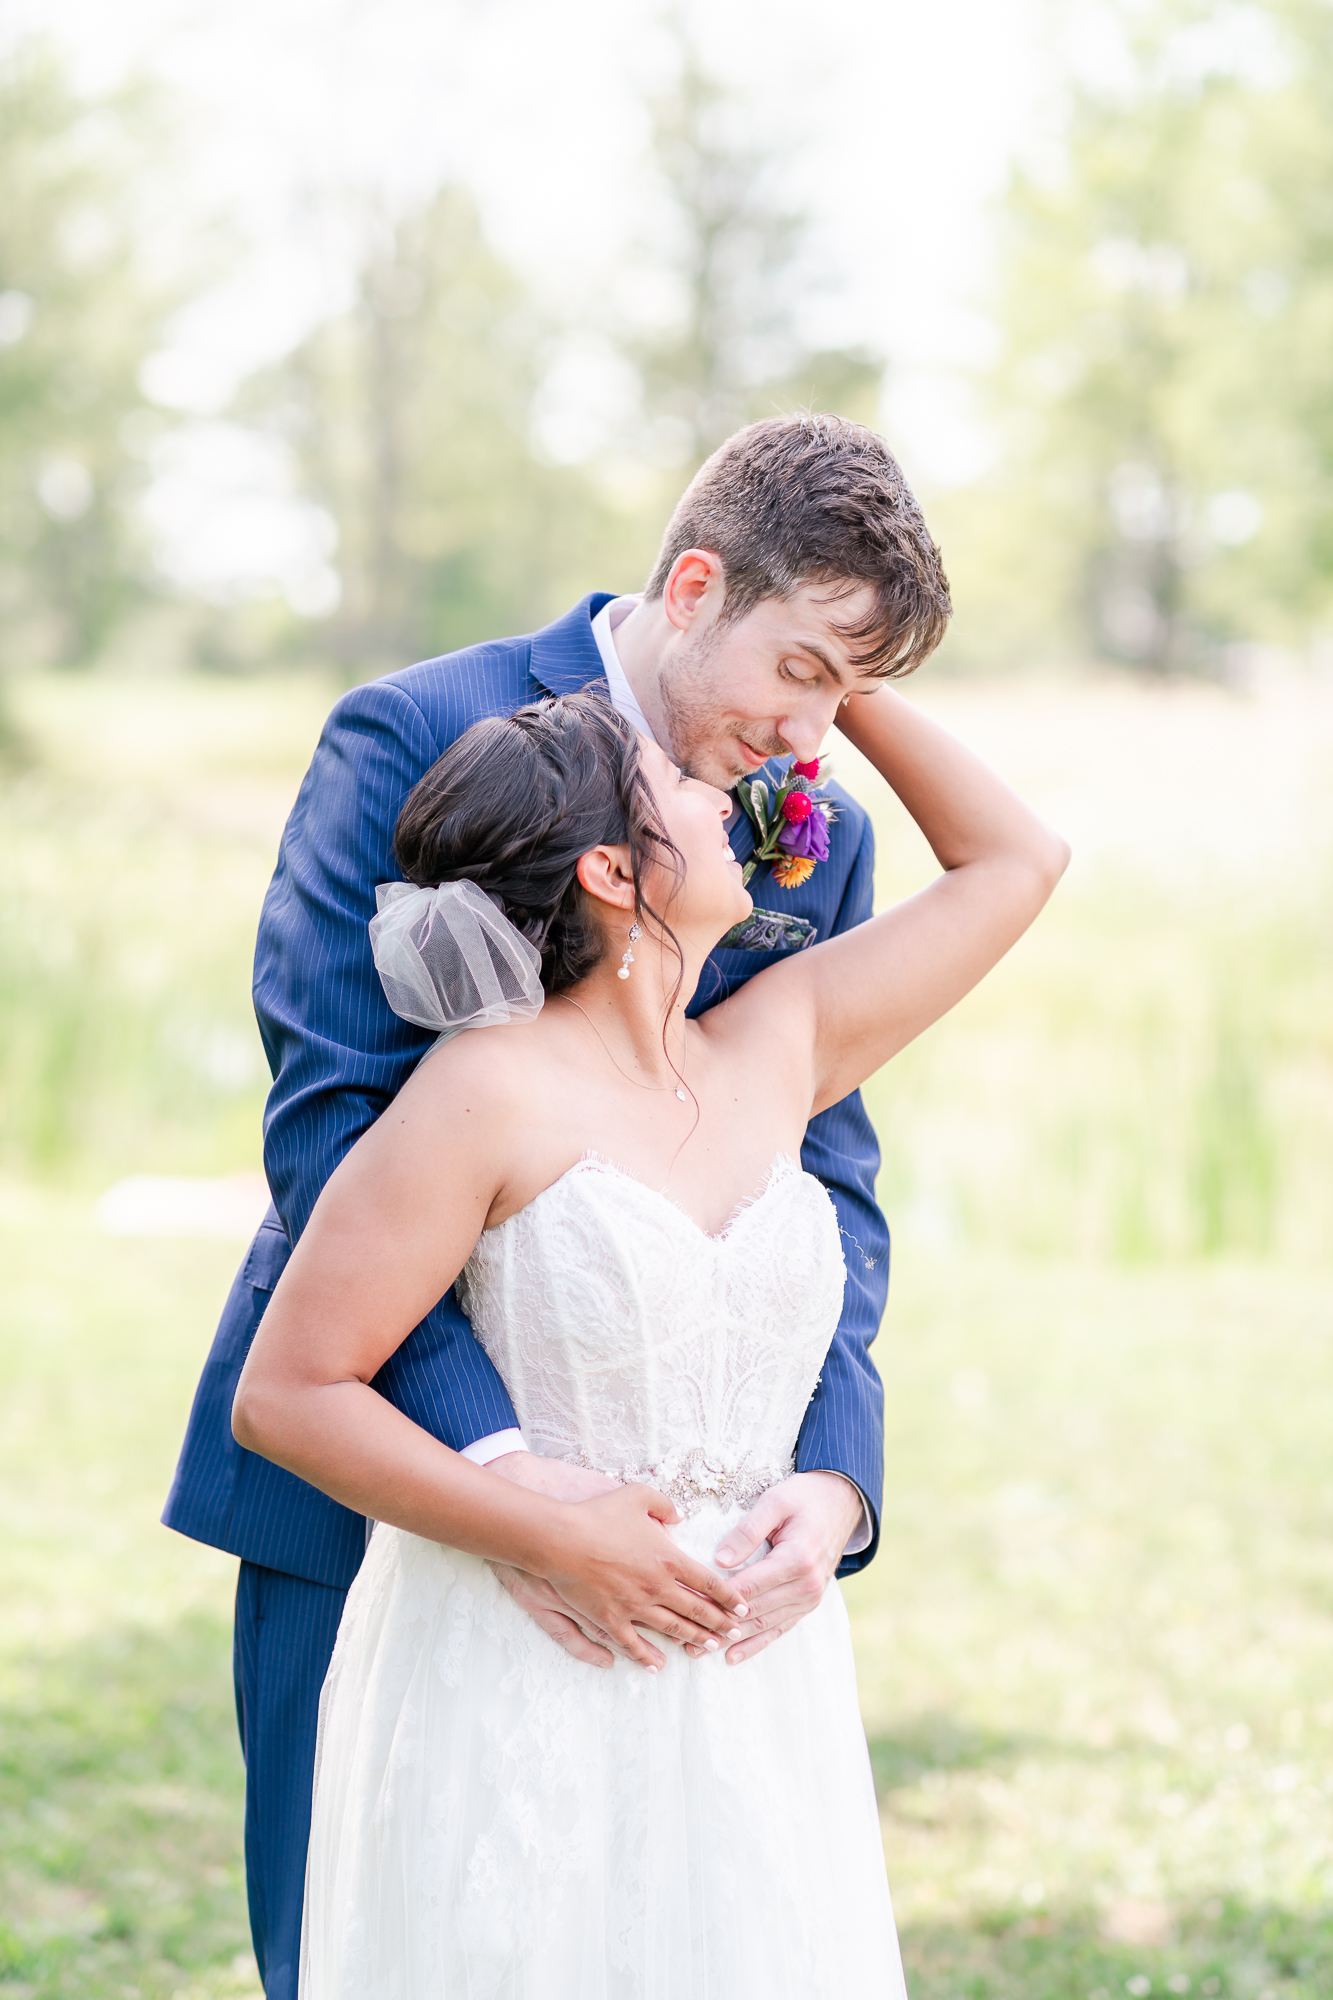 Maria+Adam_Summer Barn Wedding_The Barn and The North Star Preserve_Oberlin_Ohio-146.jpg